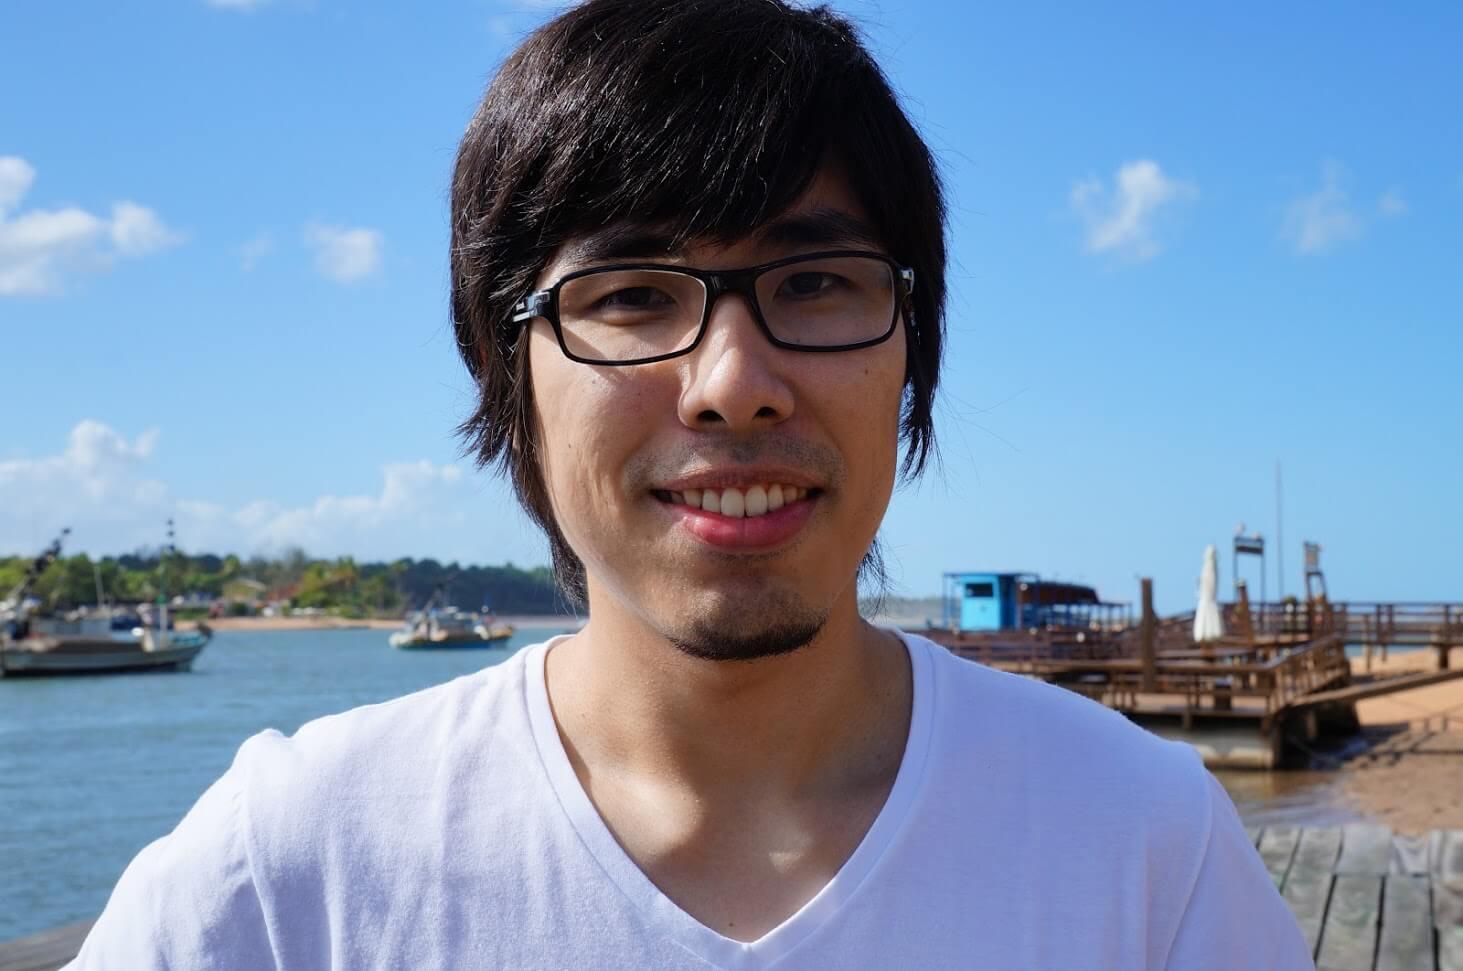 Hideki Katsumoto